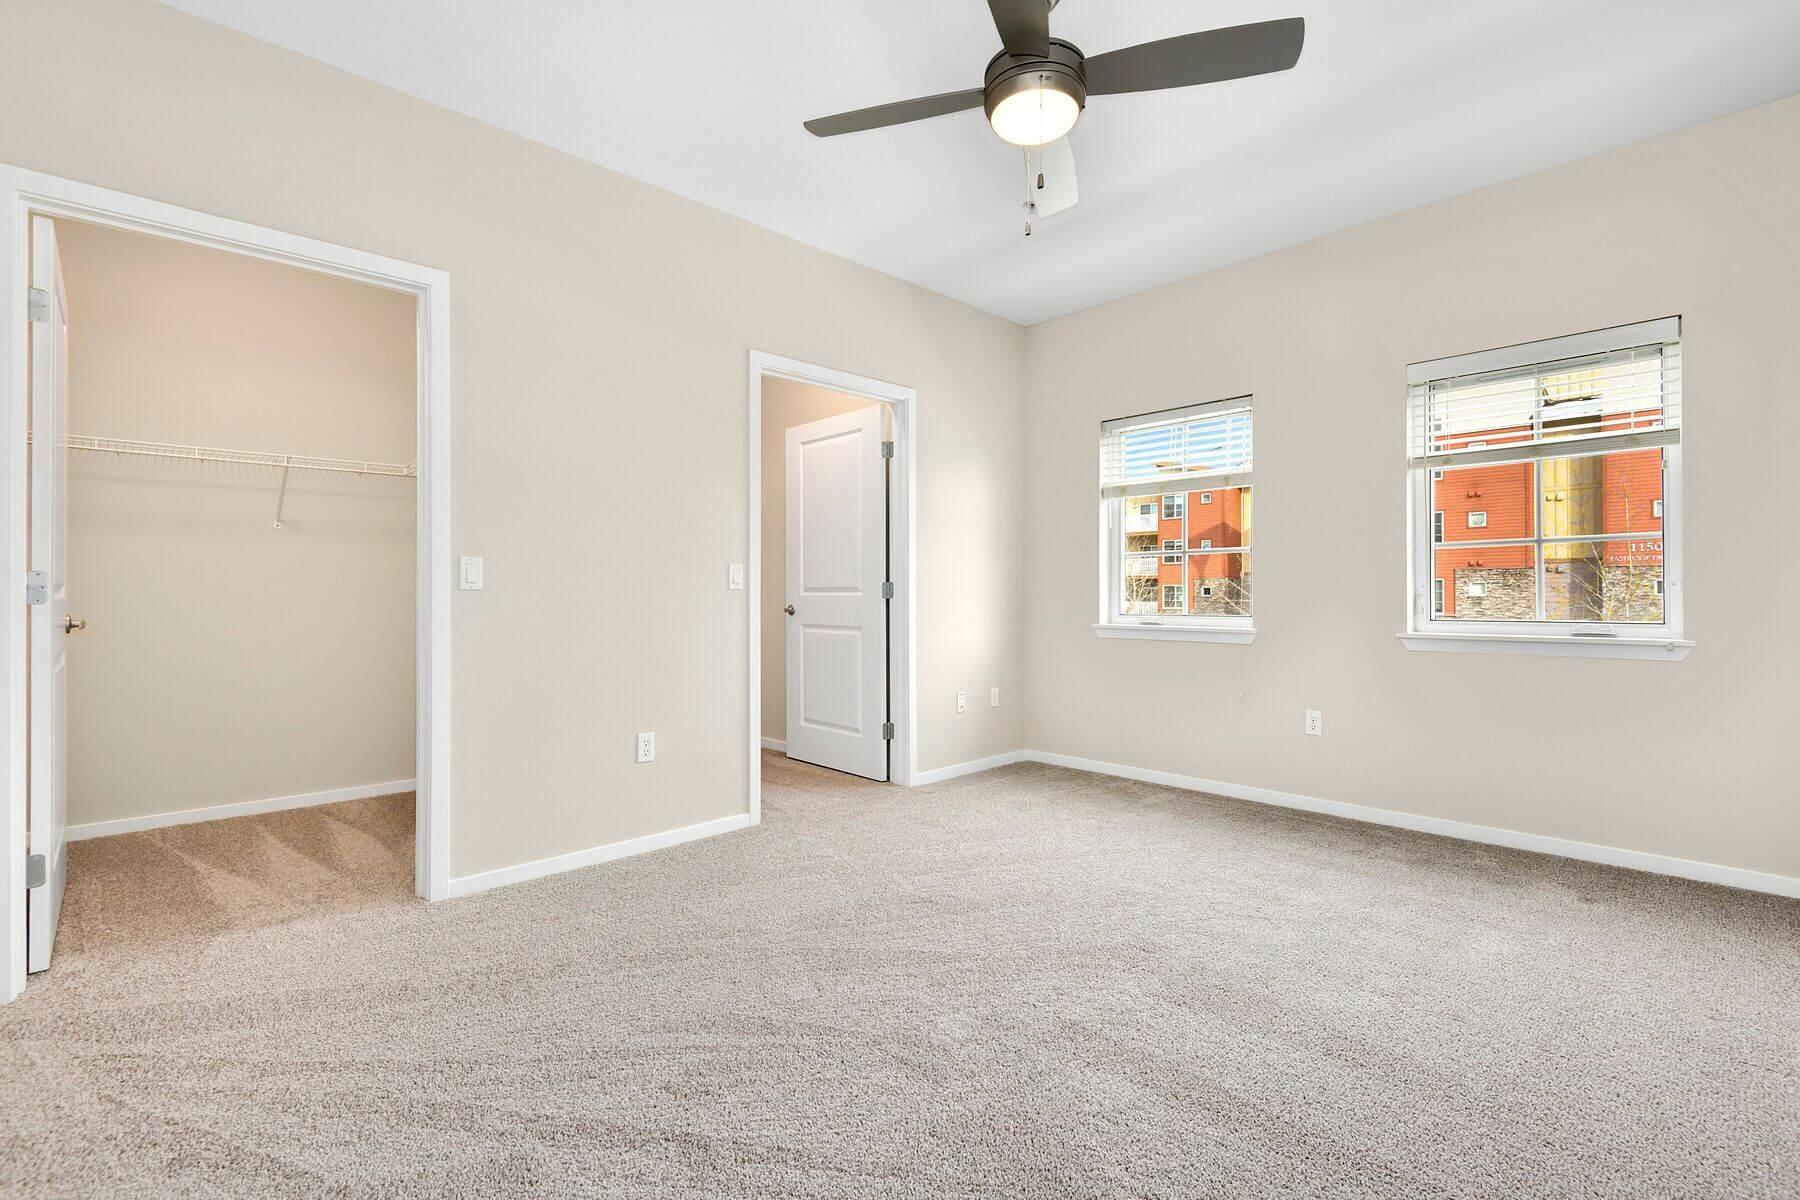 Neutral Carpet Color at Reunion at Redmond Ridge, WA , 98053